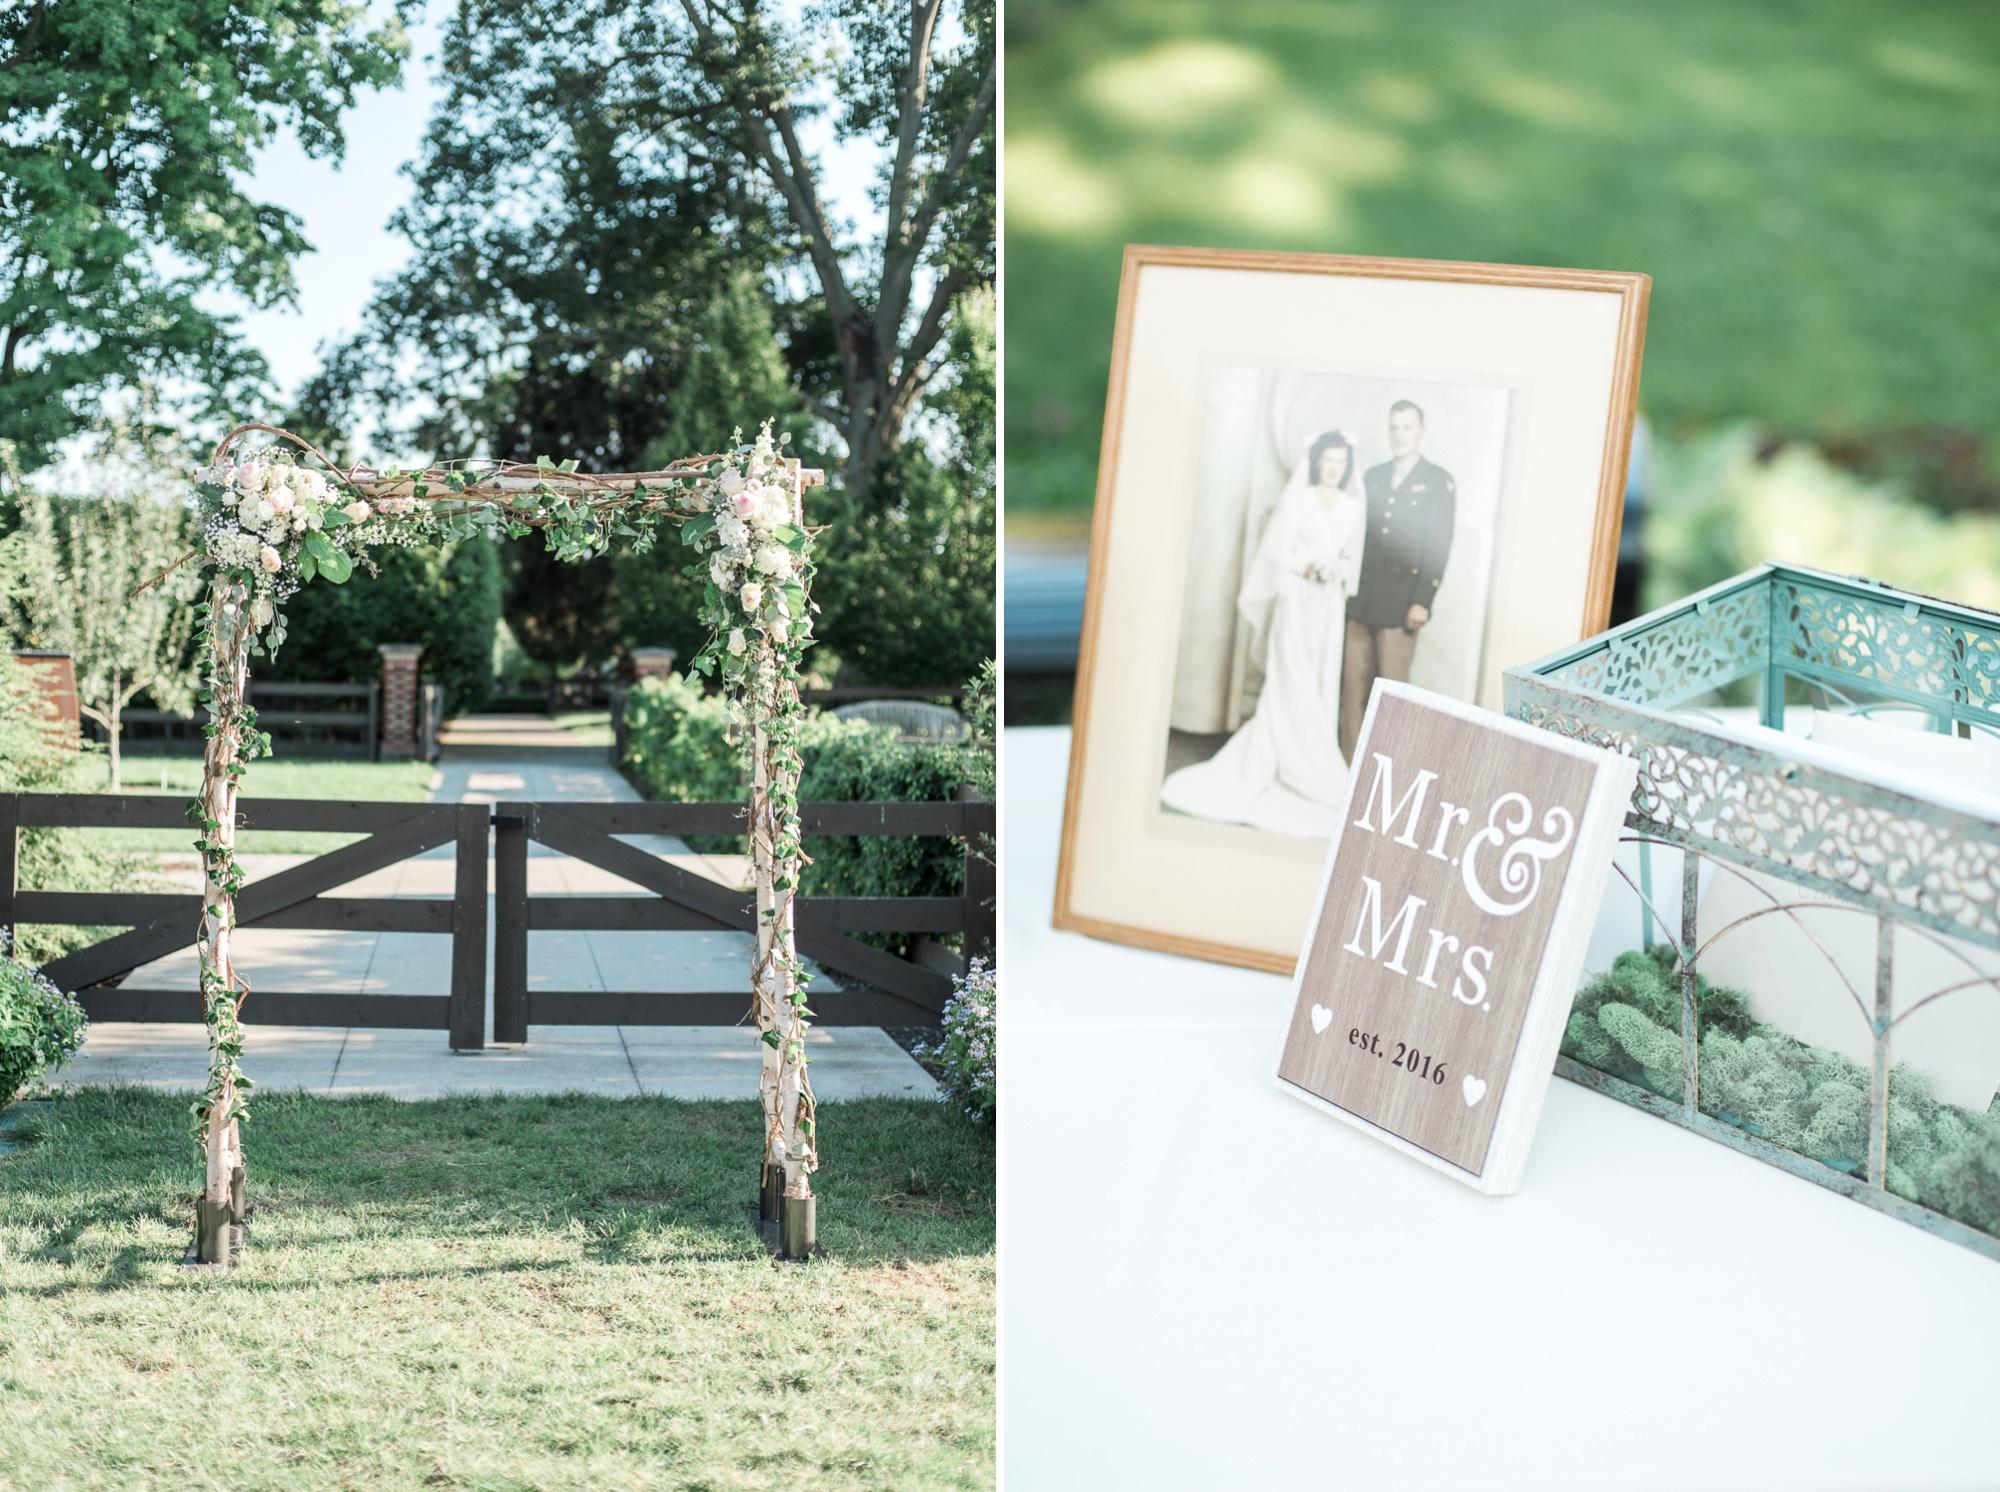 wells-barn-wedding-at-franklin-park-conservatory-68.jpg